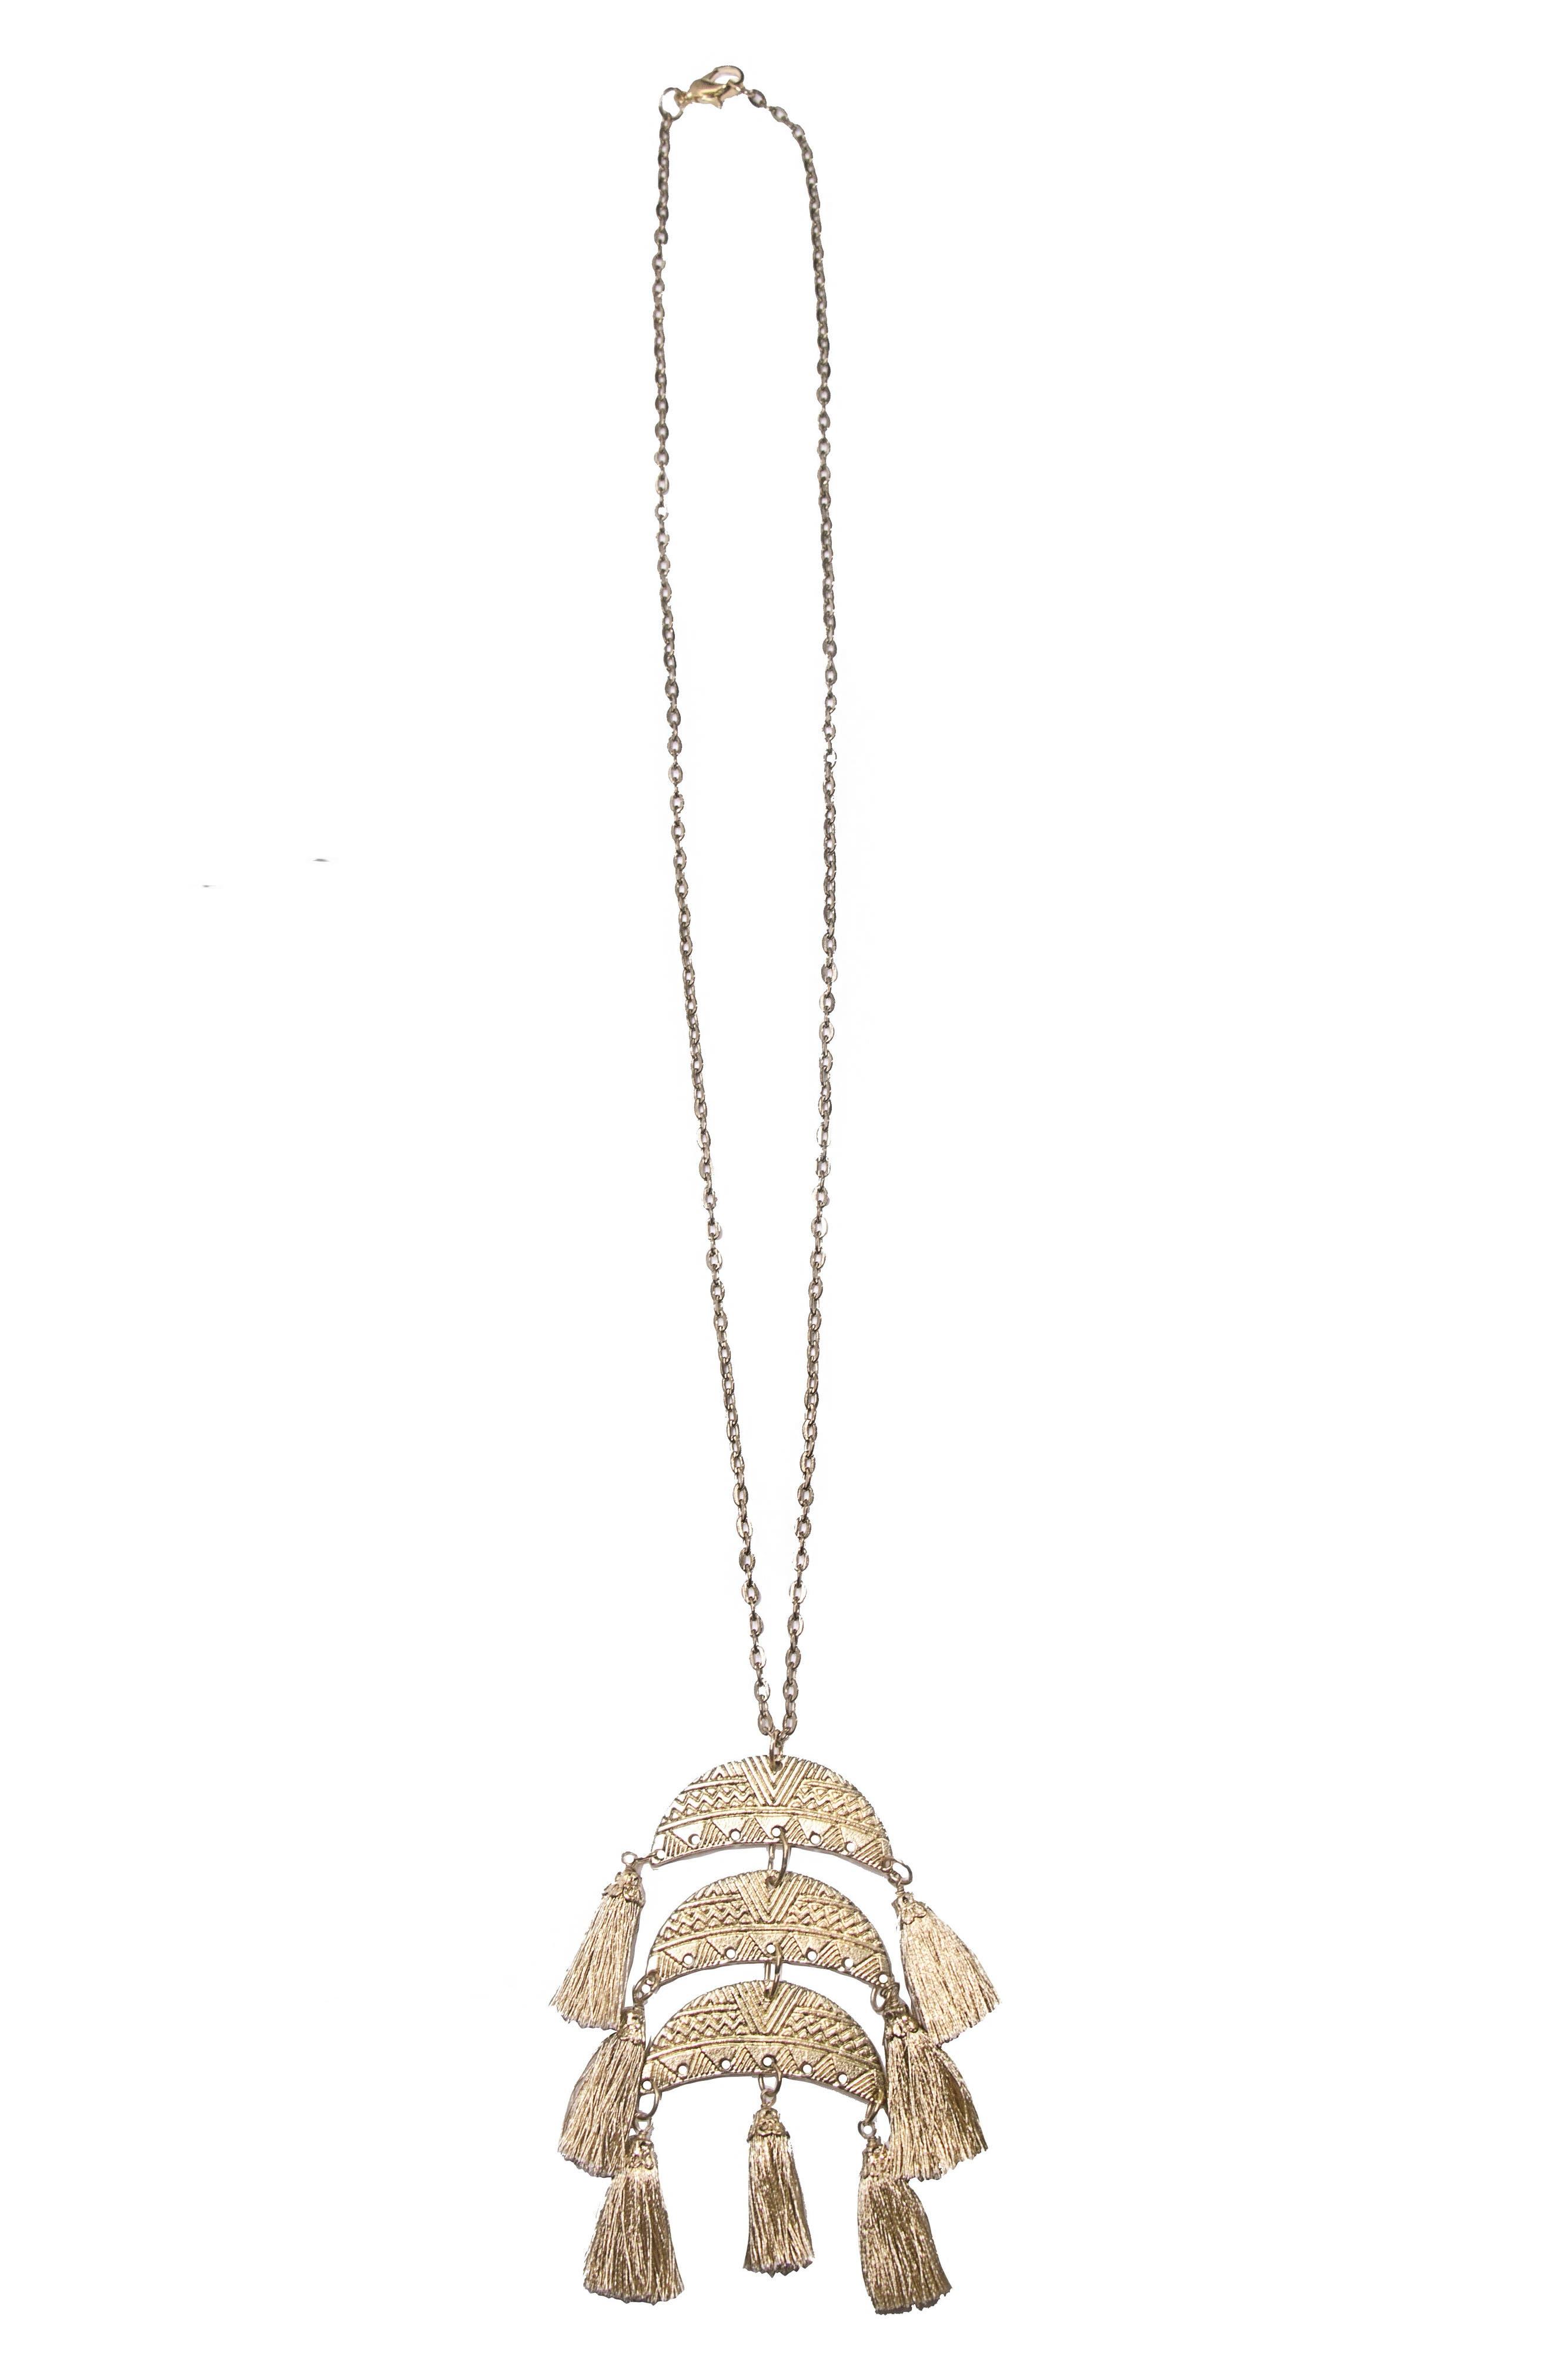 Main Image - Area Stars Goa Pendant Necklace